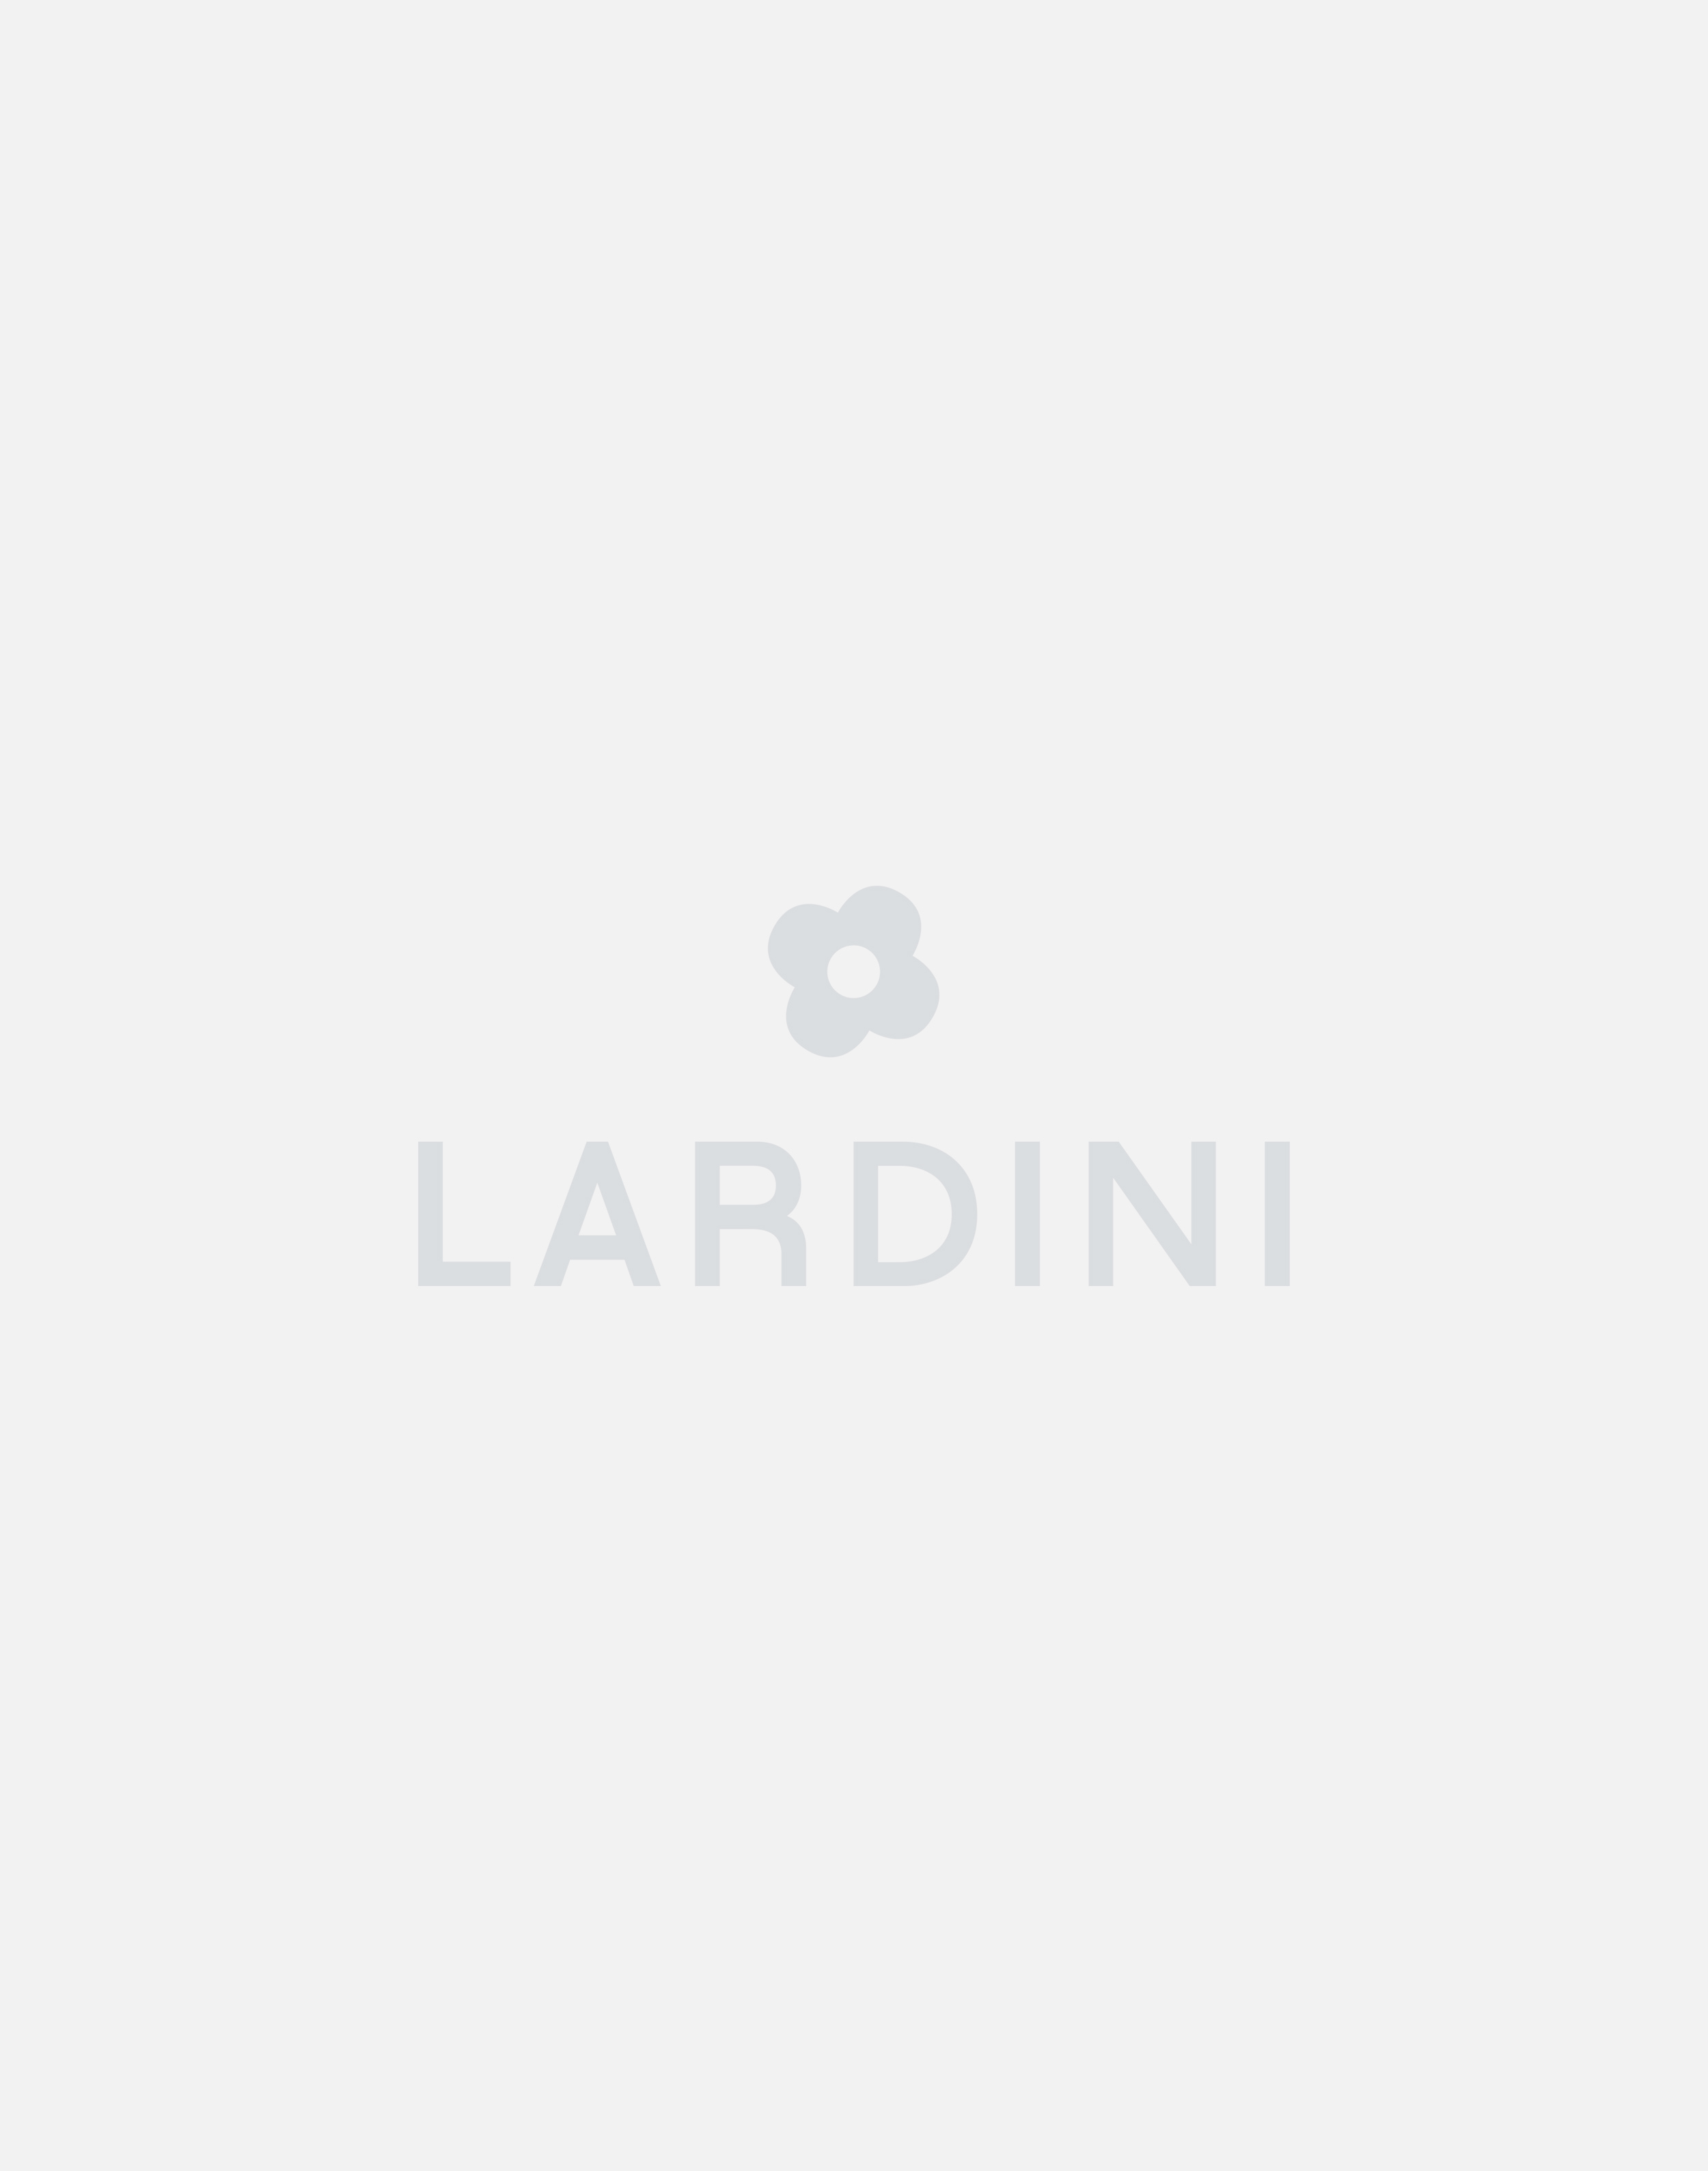 Pink printed pocket square